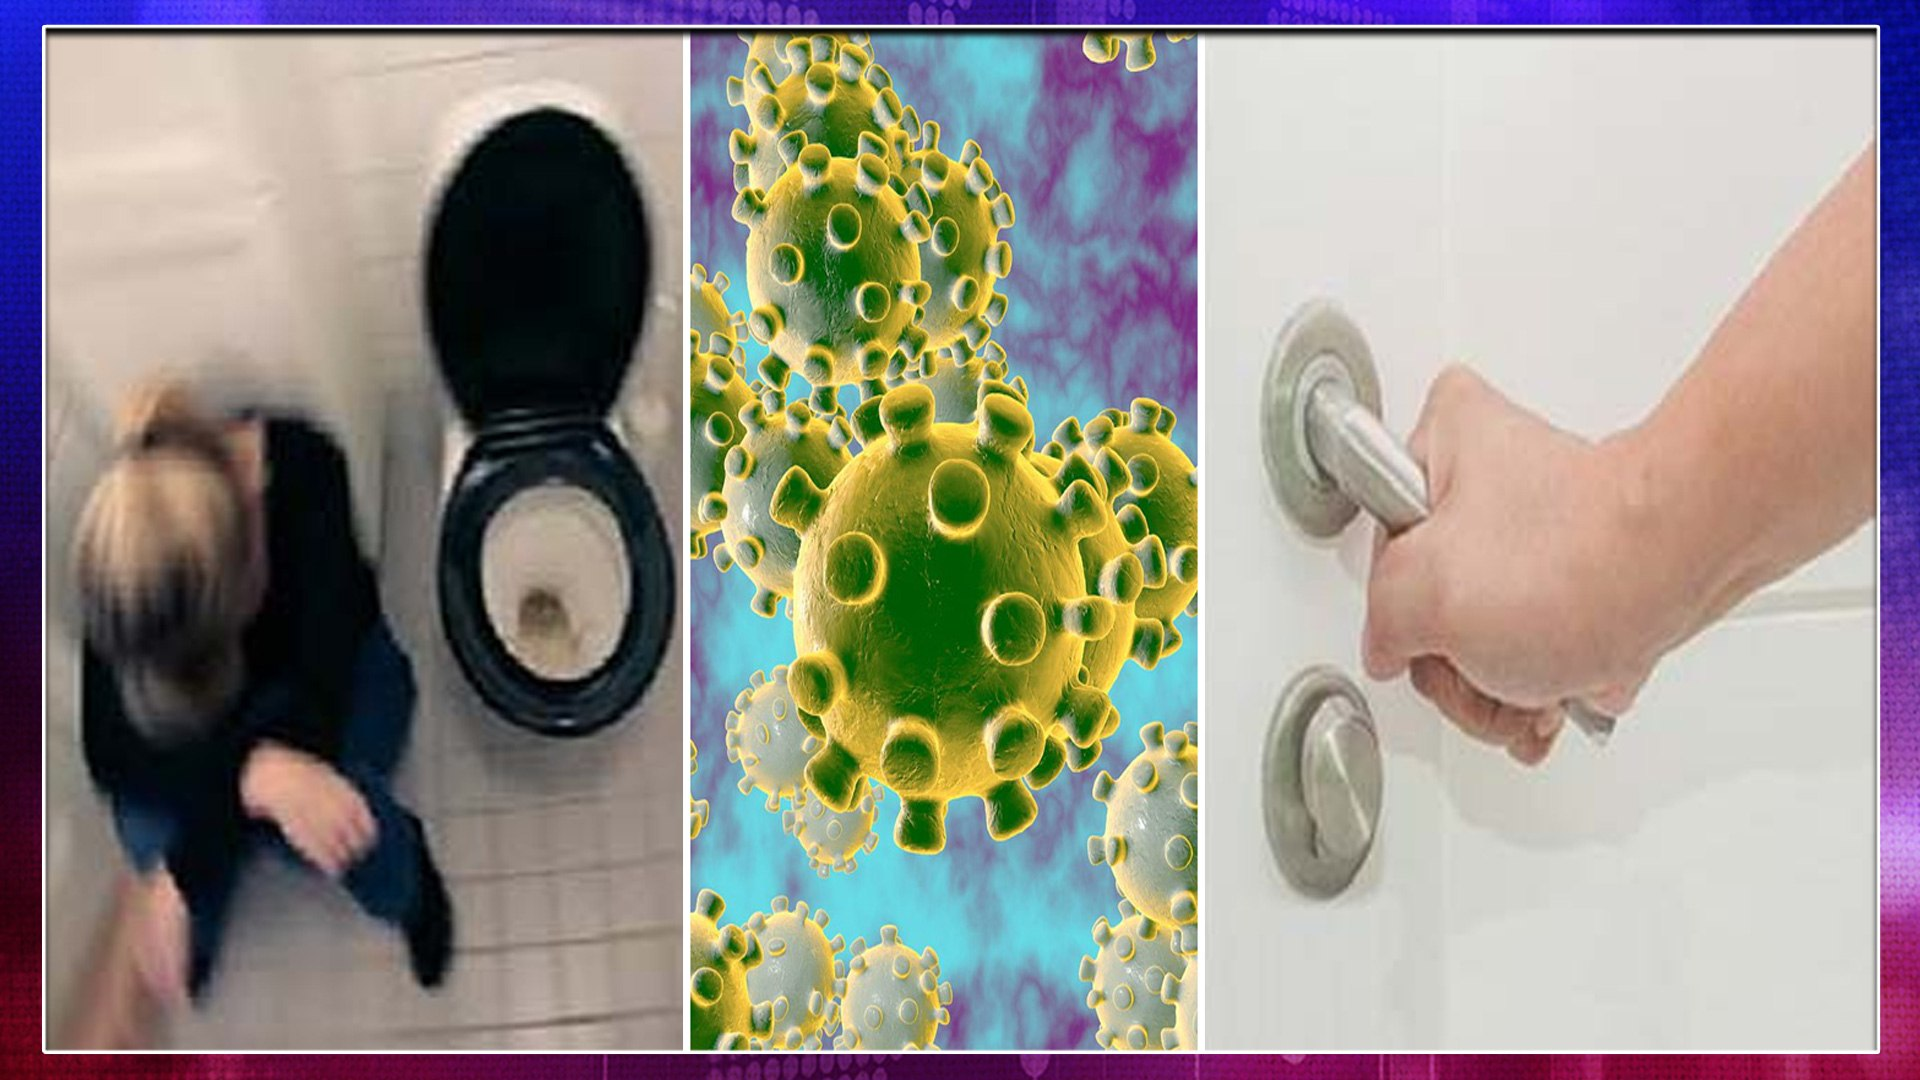 Coronavirus : Man Locks Wife In Bathroom Over Coronavirus Fears